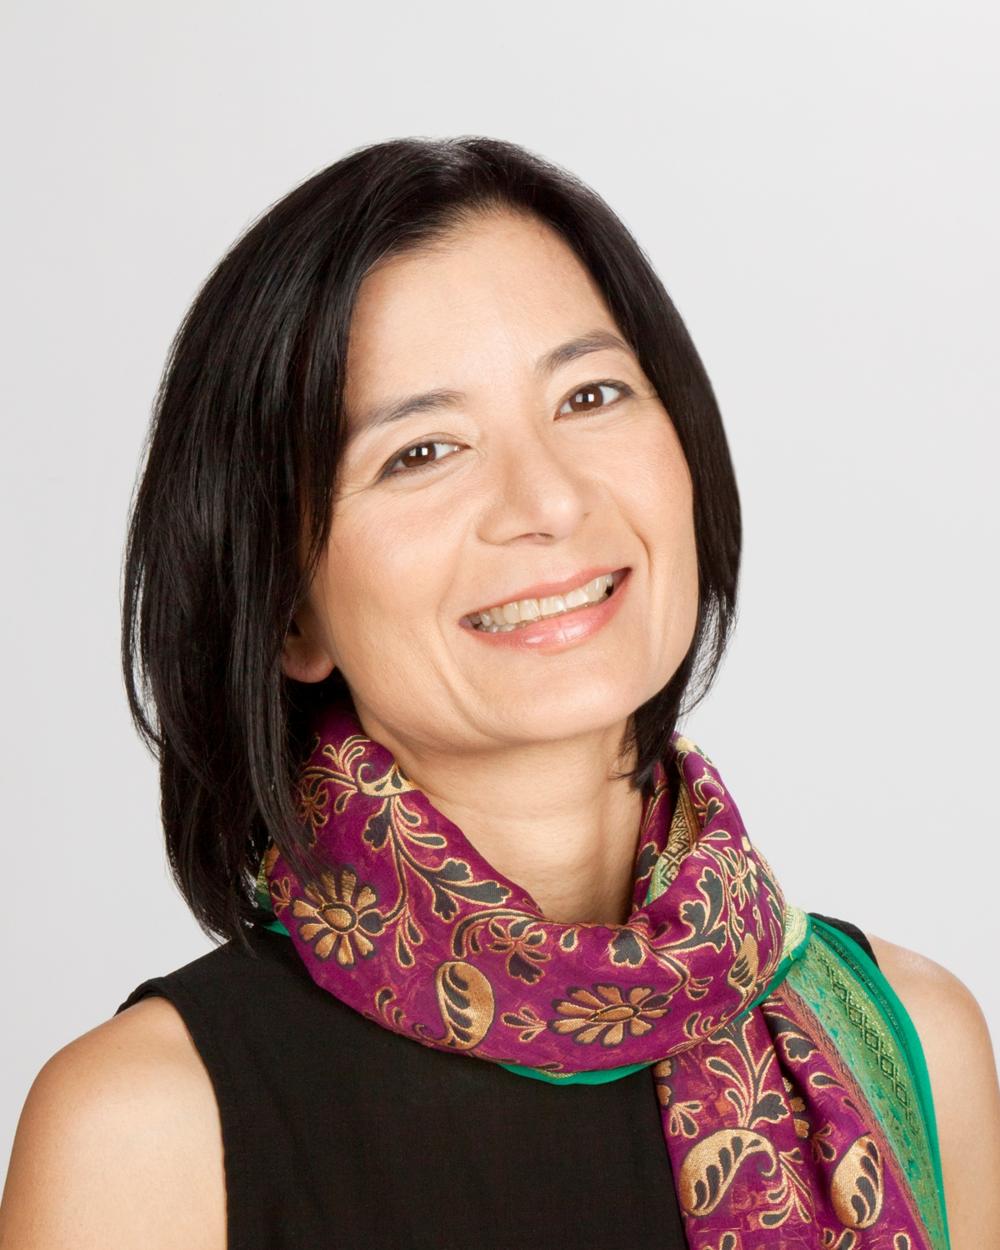 Reeta roy,President & CEO of The MasterCard Foundation